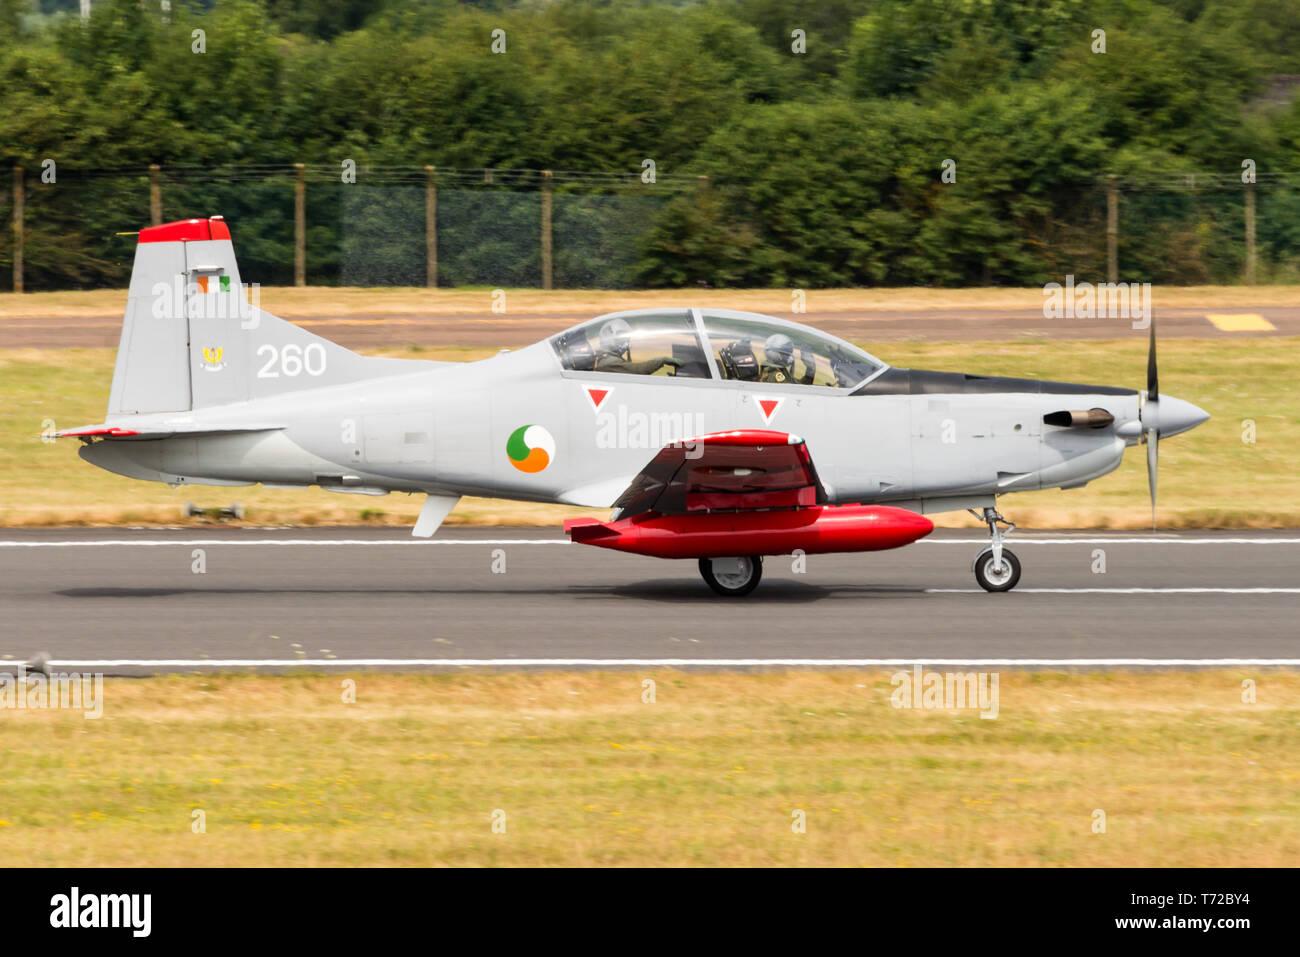 A Pilatus PC-9M advanced trainer aircraft of the Irish Air Corps. - Stock Image